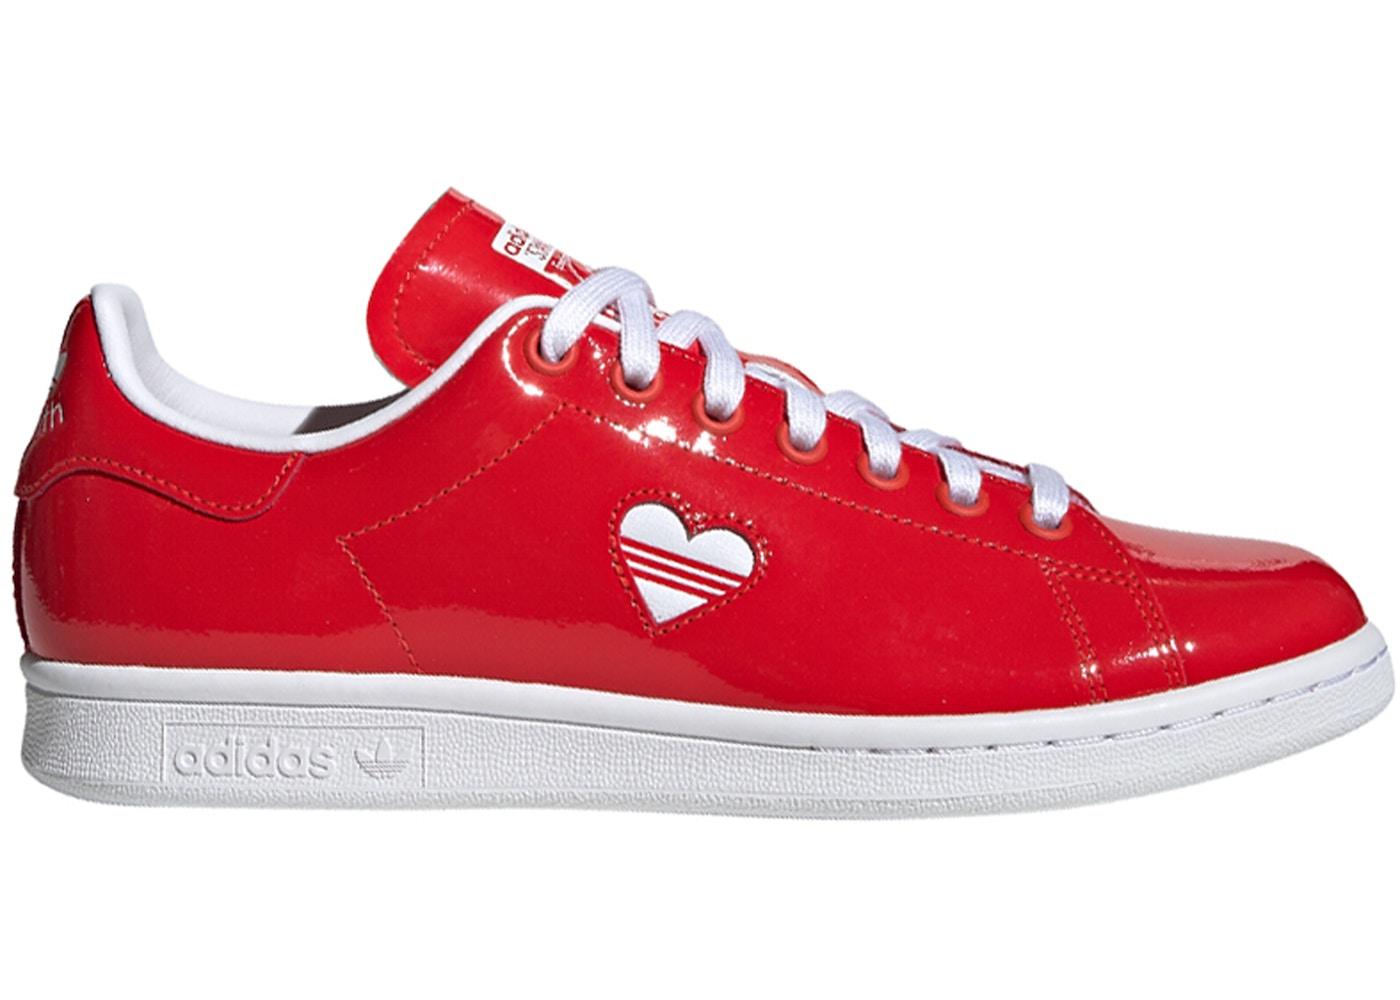 adidas Stan Smith Valentines Day 2019 Red (W)